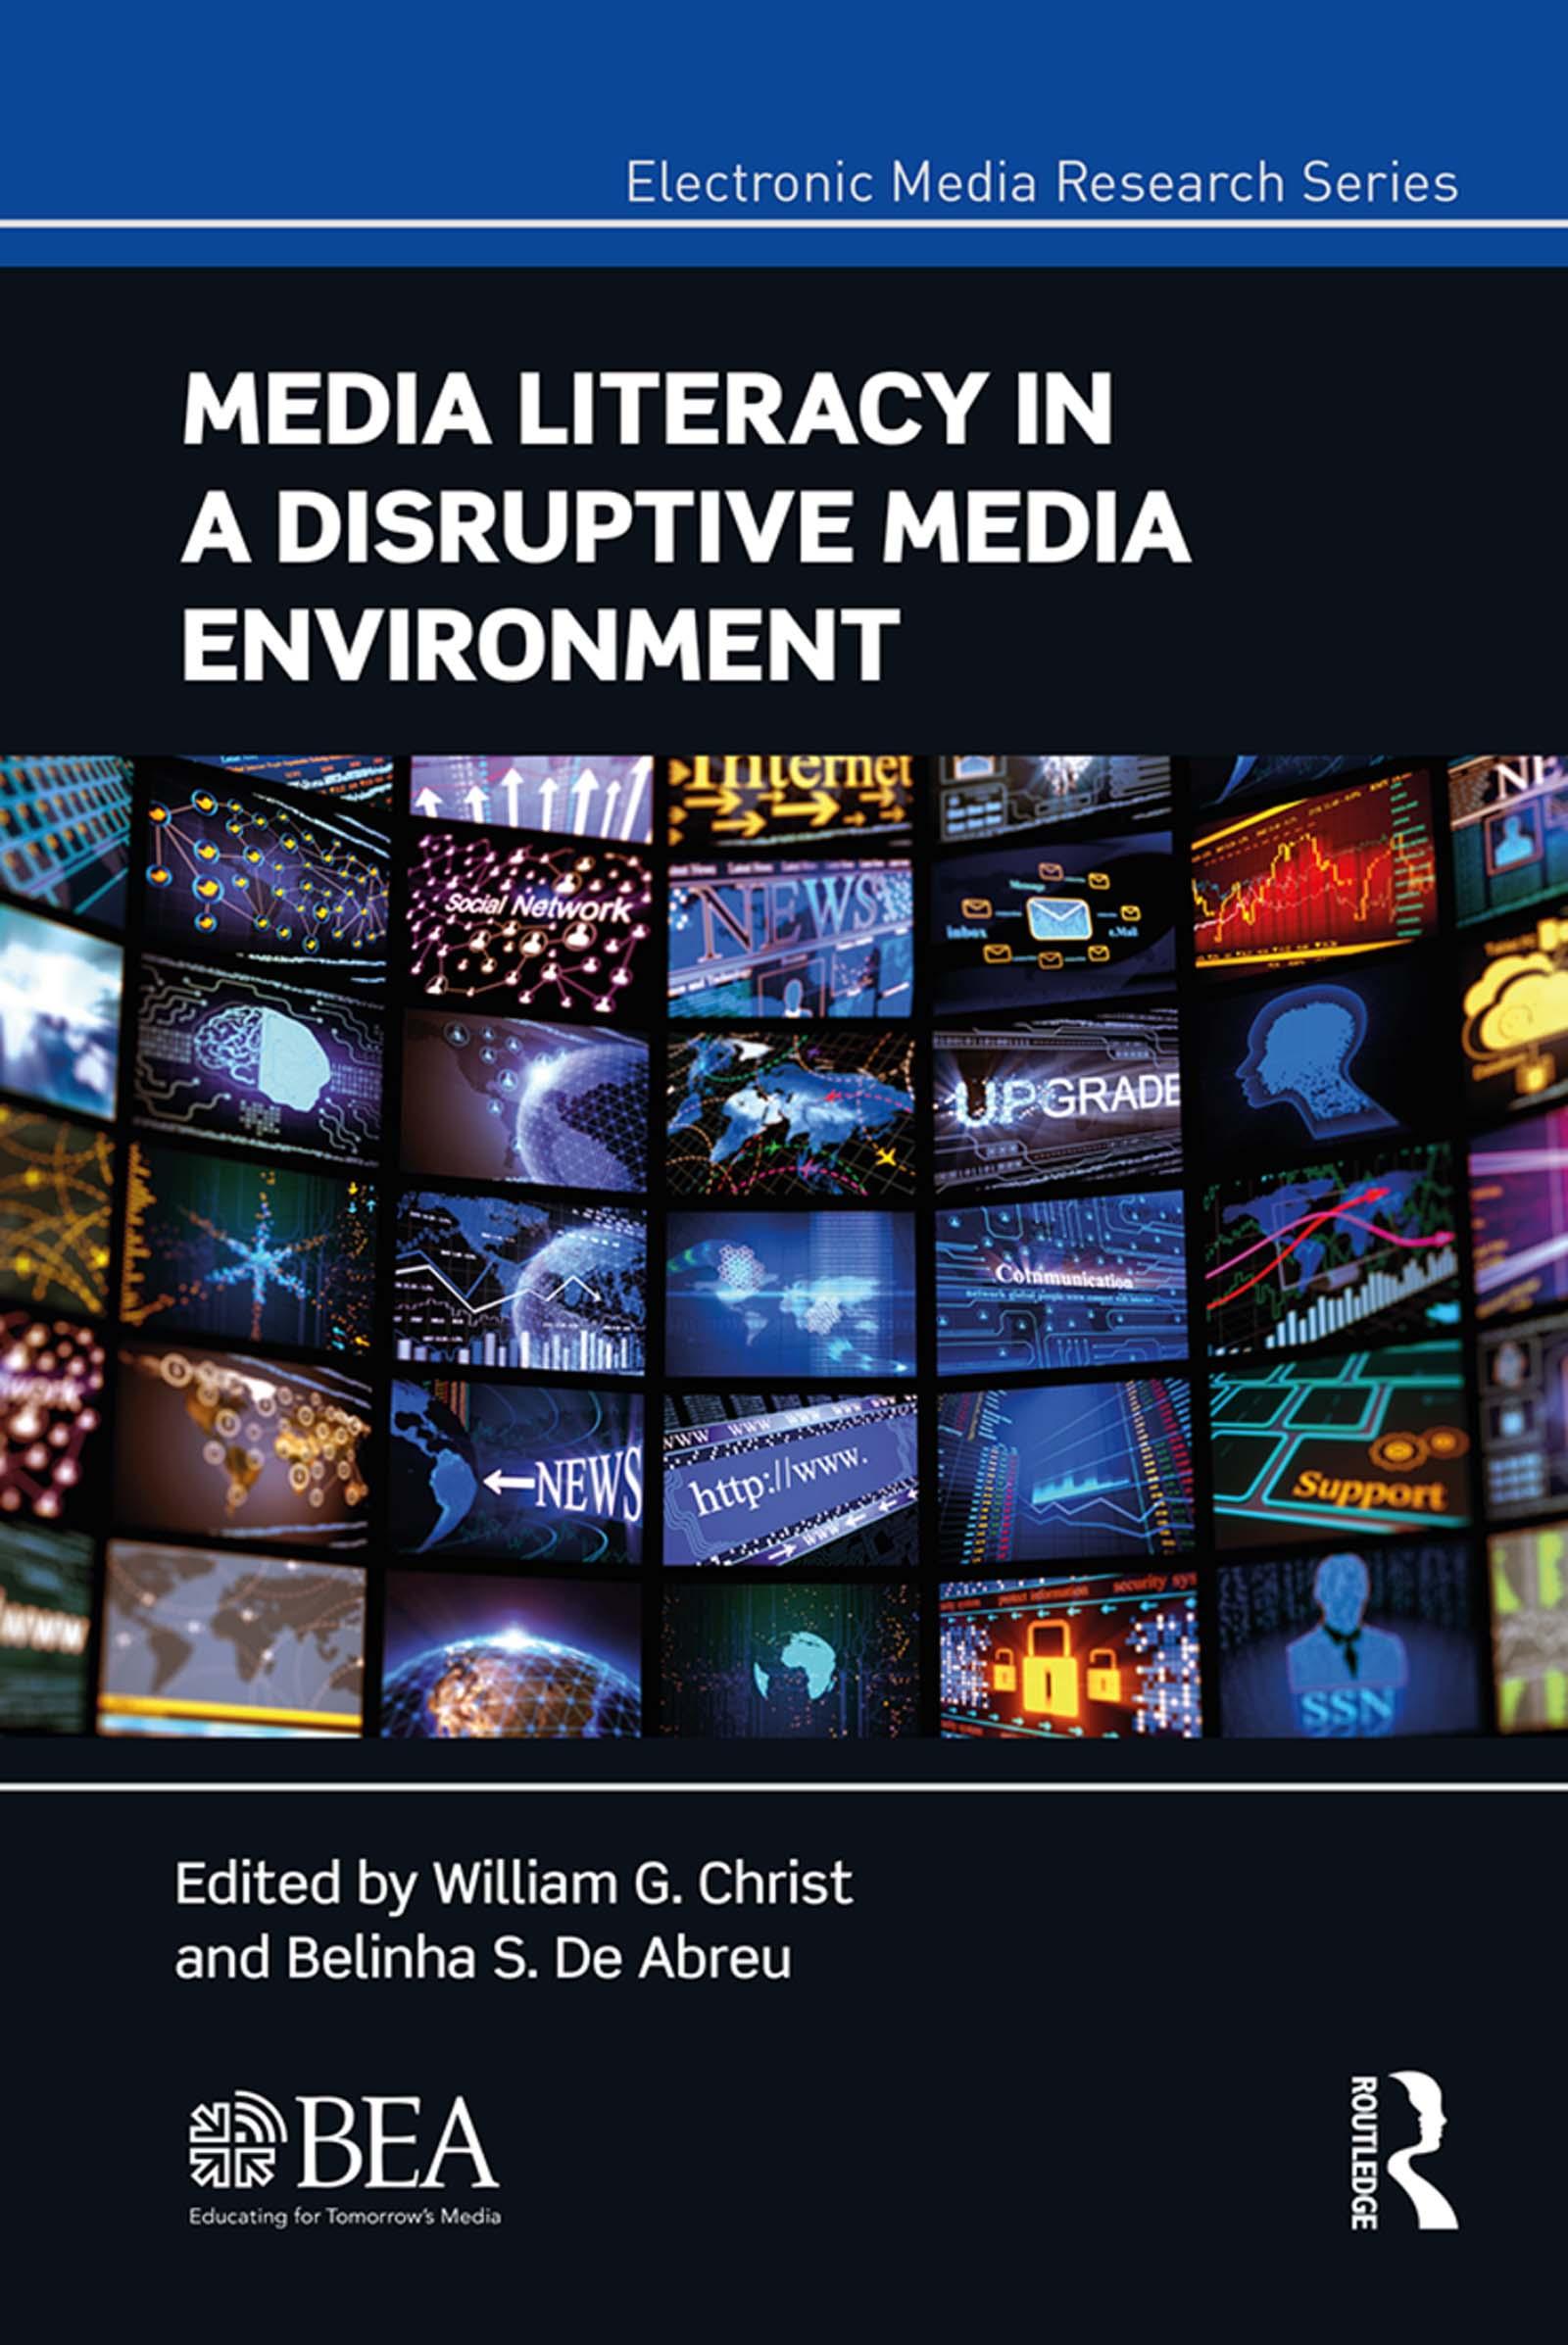 Propaganda Critic, Russian Disinformation, and Media Literacy